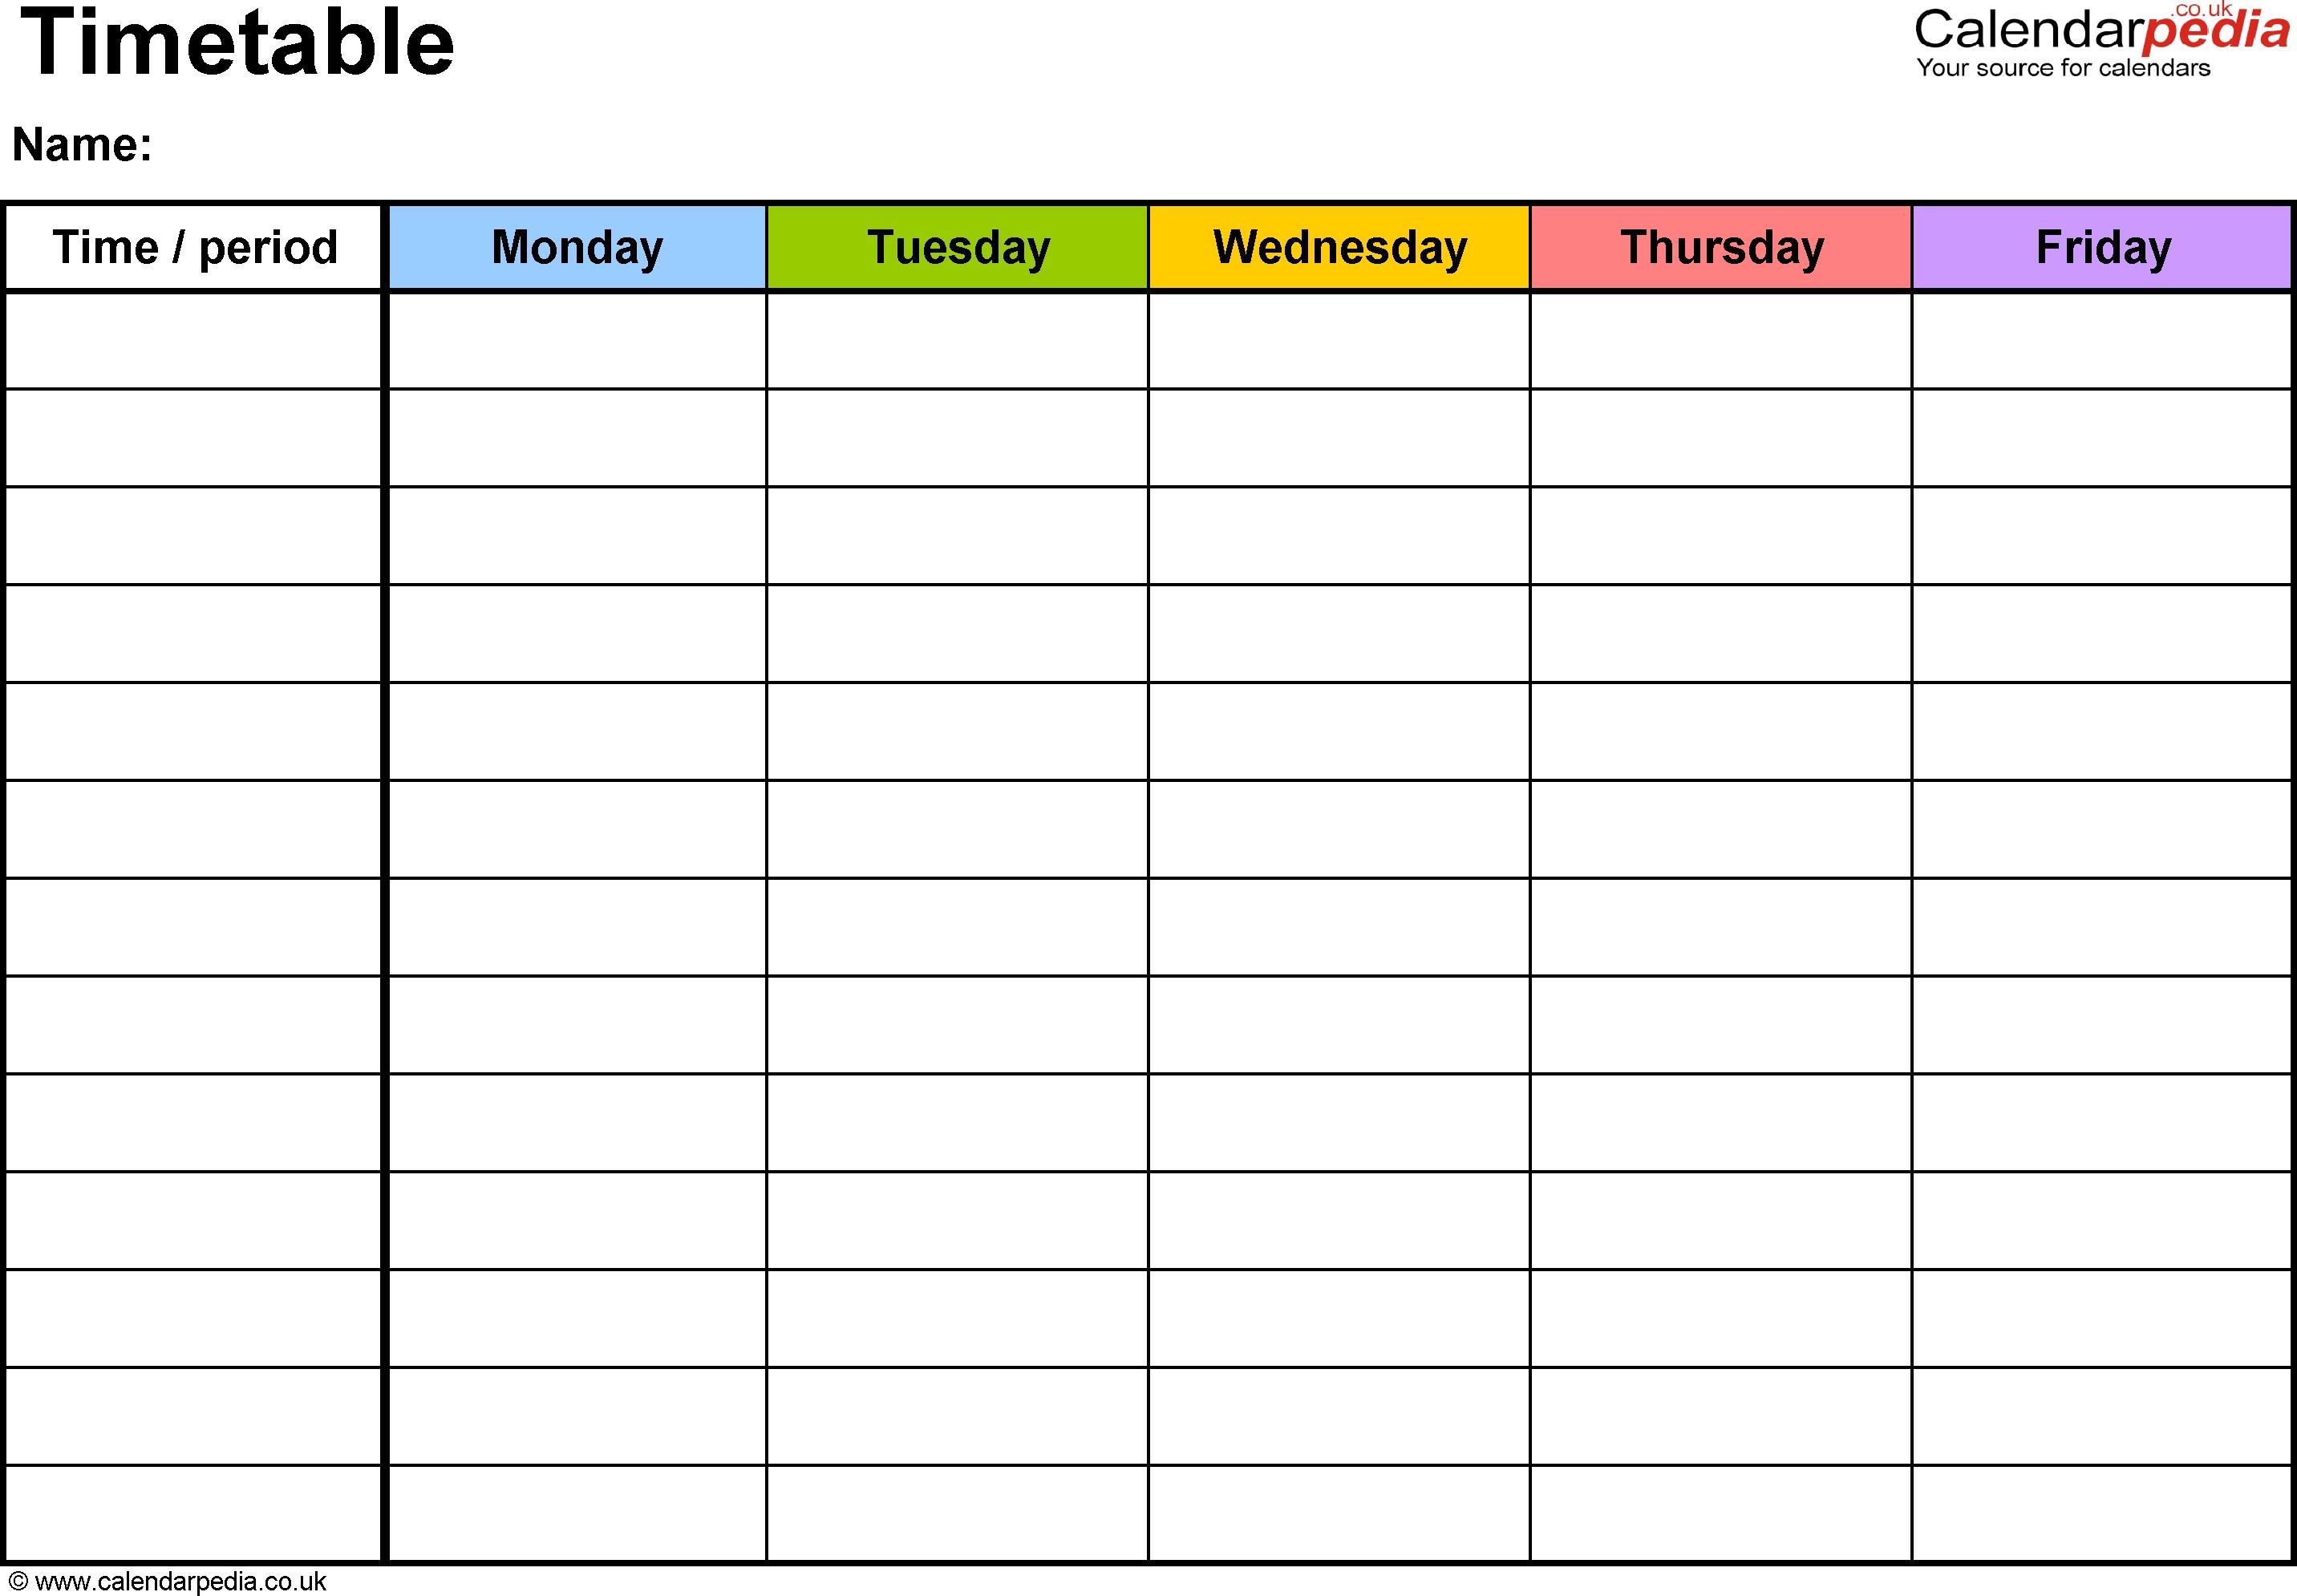 Pdf Timetable Template 2: Landscape Format, A4, 1 Page